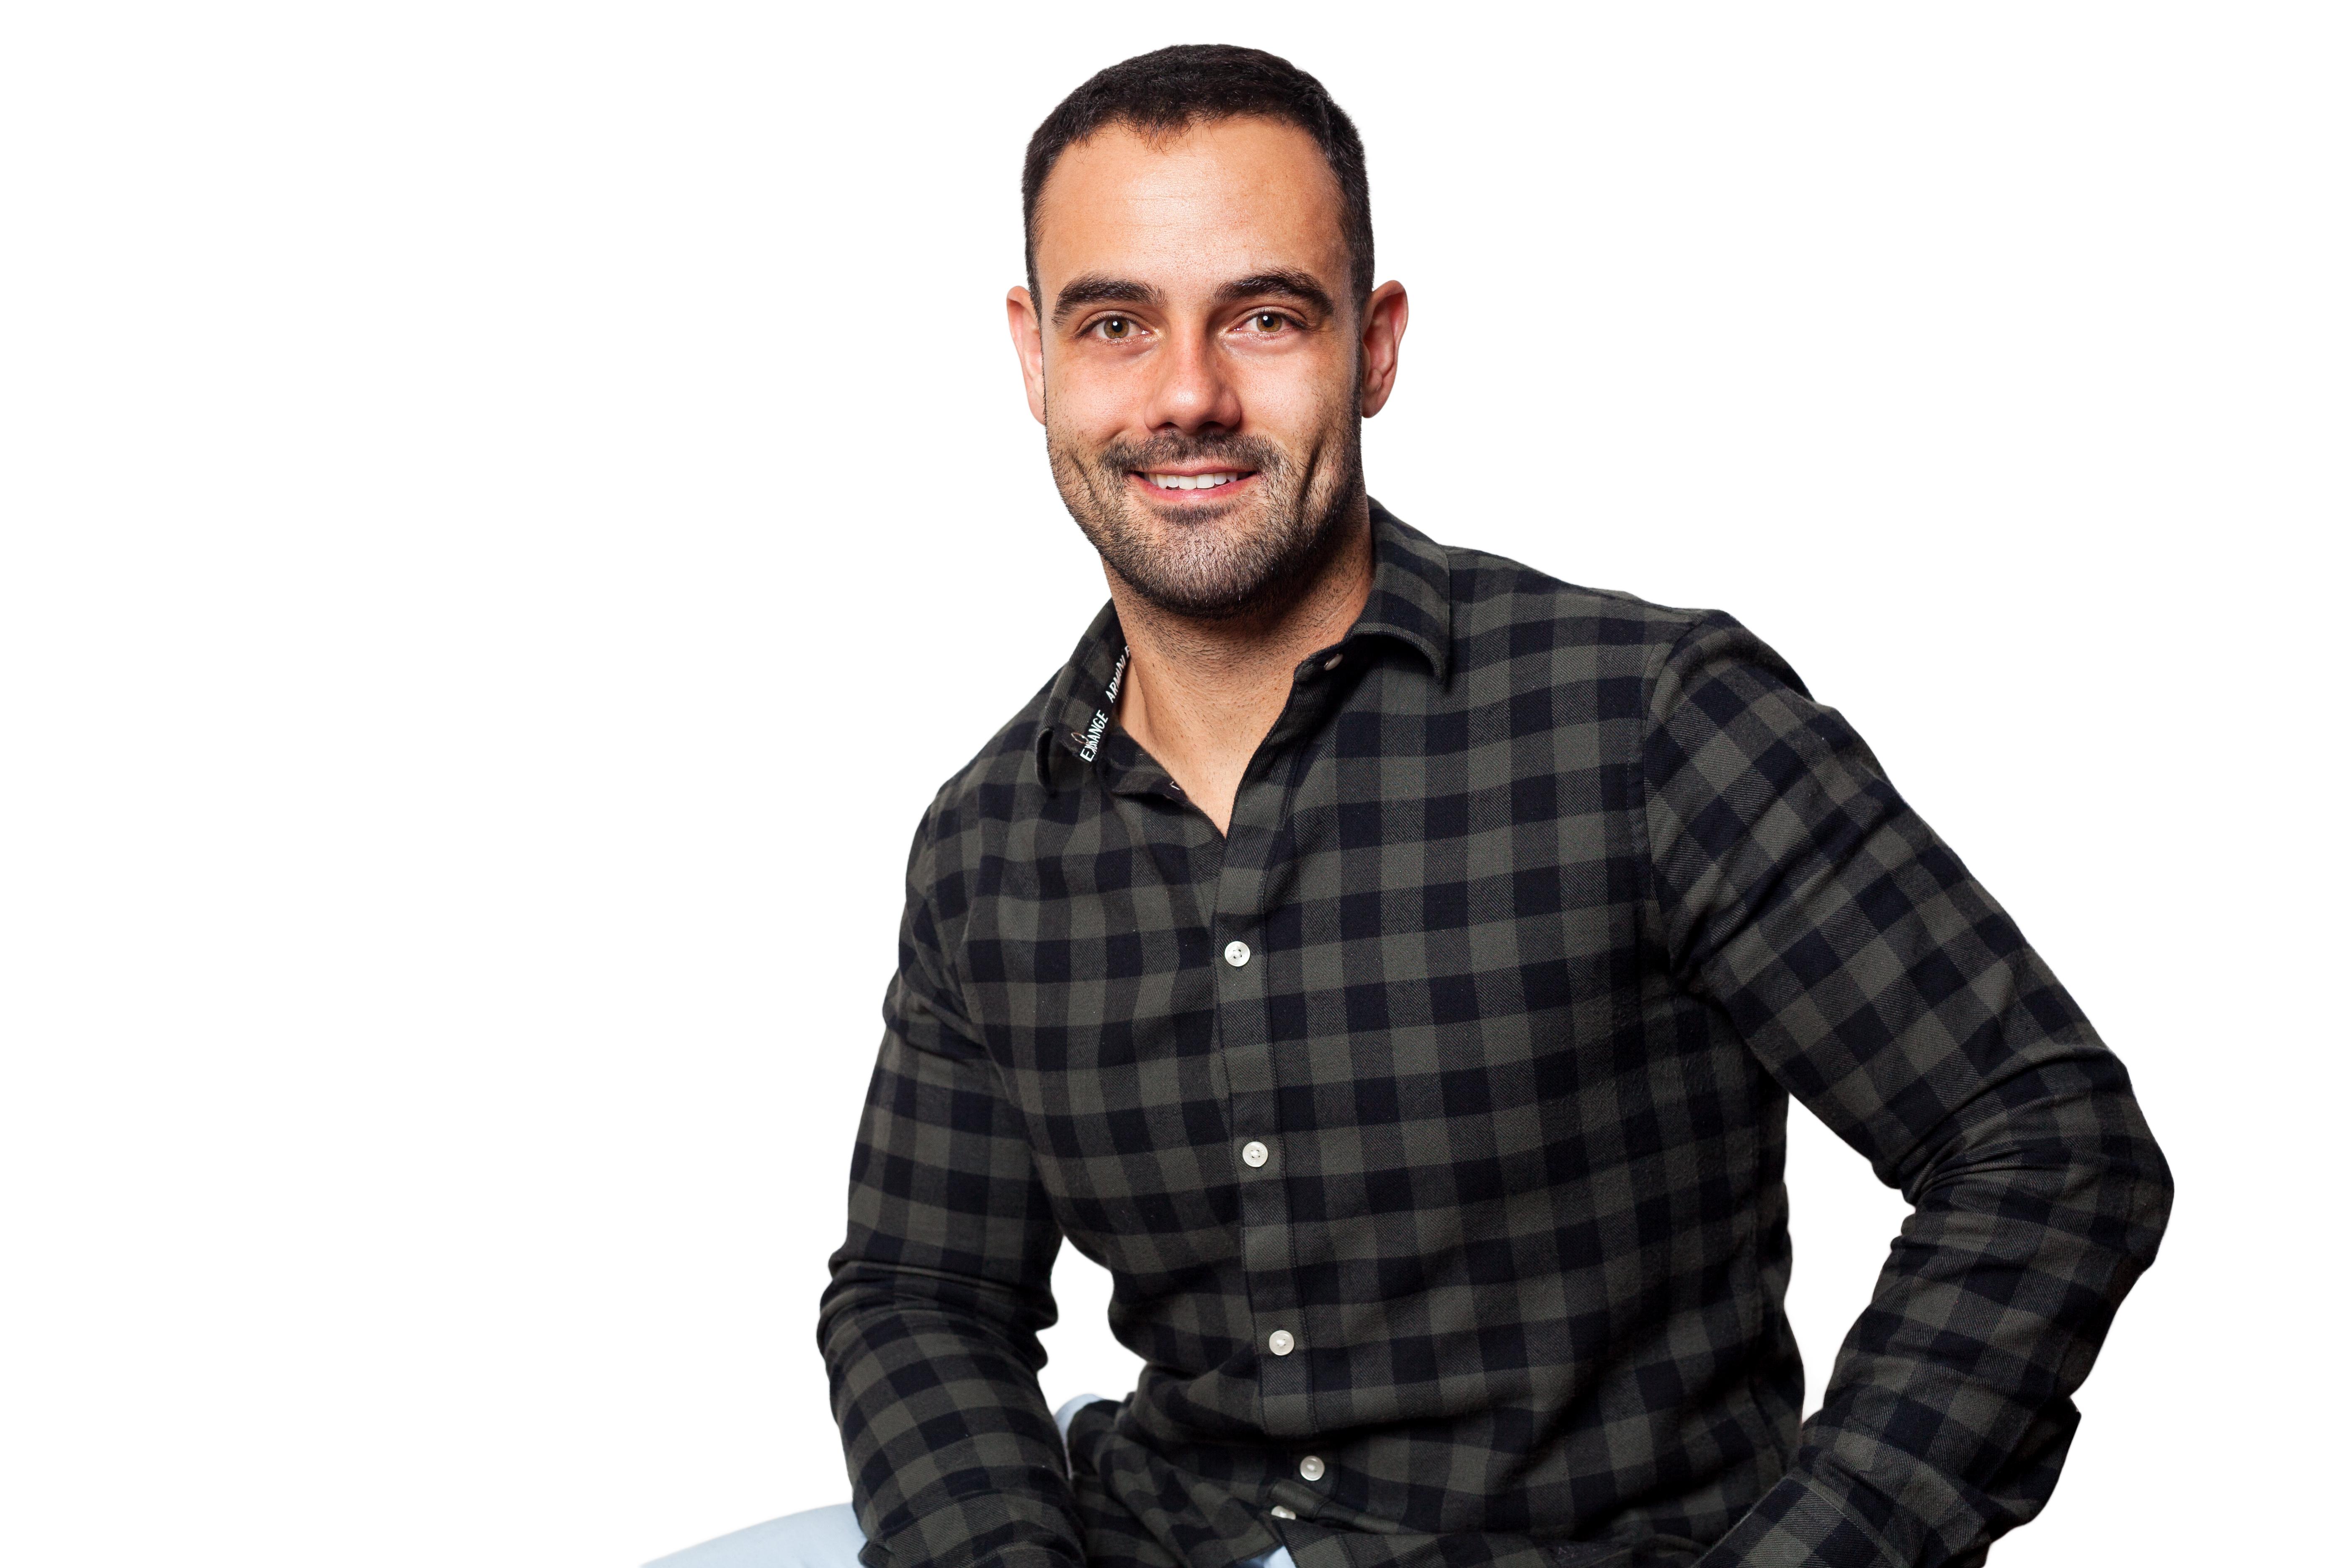 O executivo Matheus Patelli, CEO da HempMeds Brasil